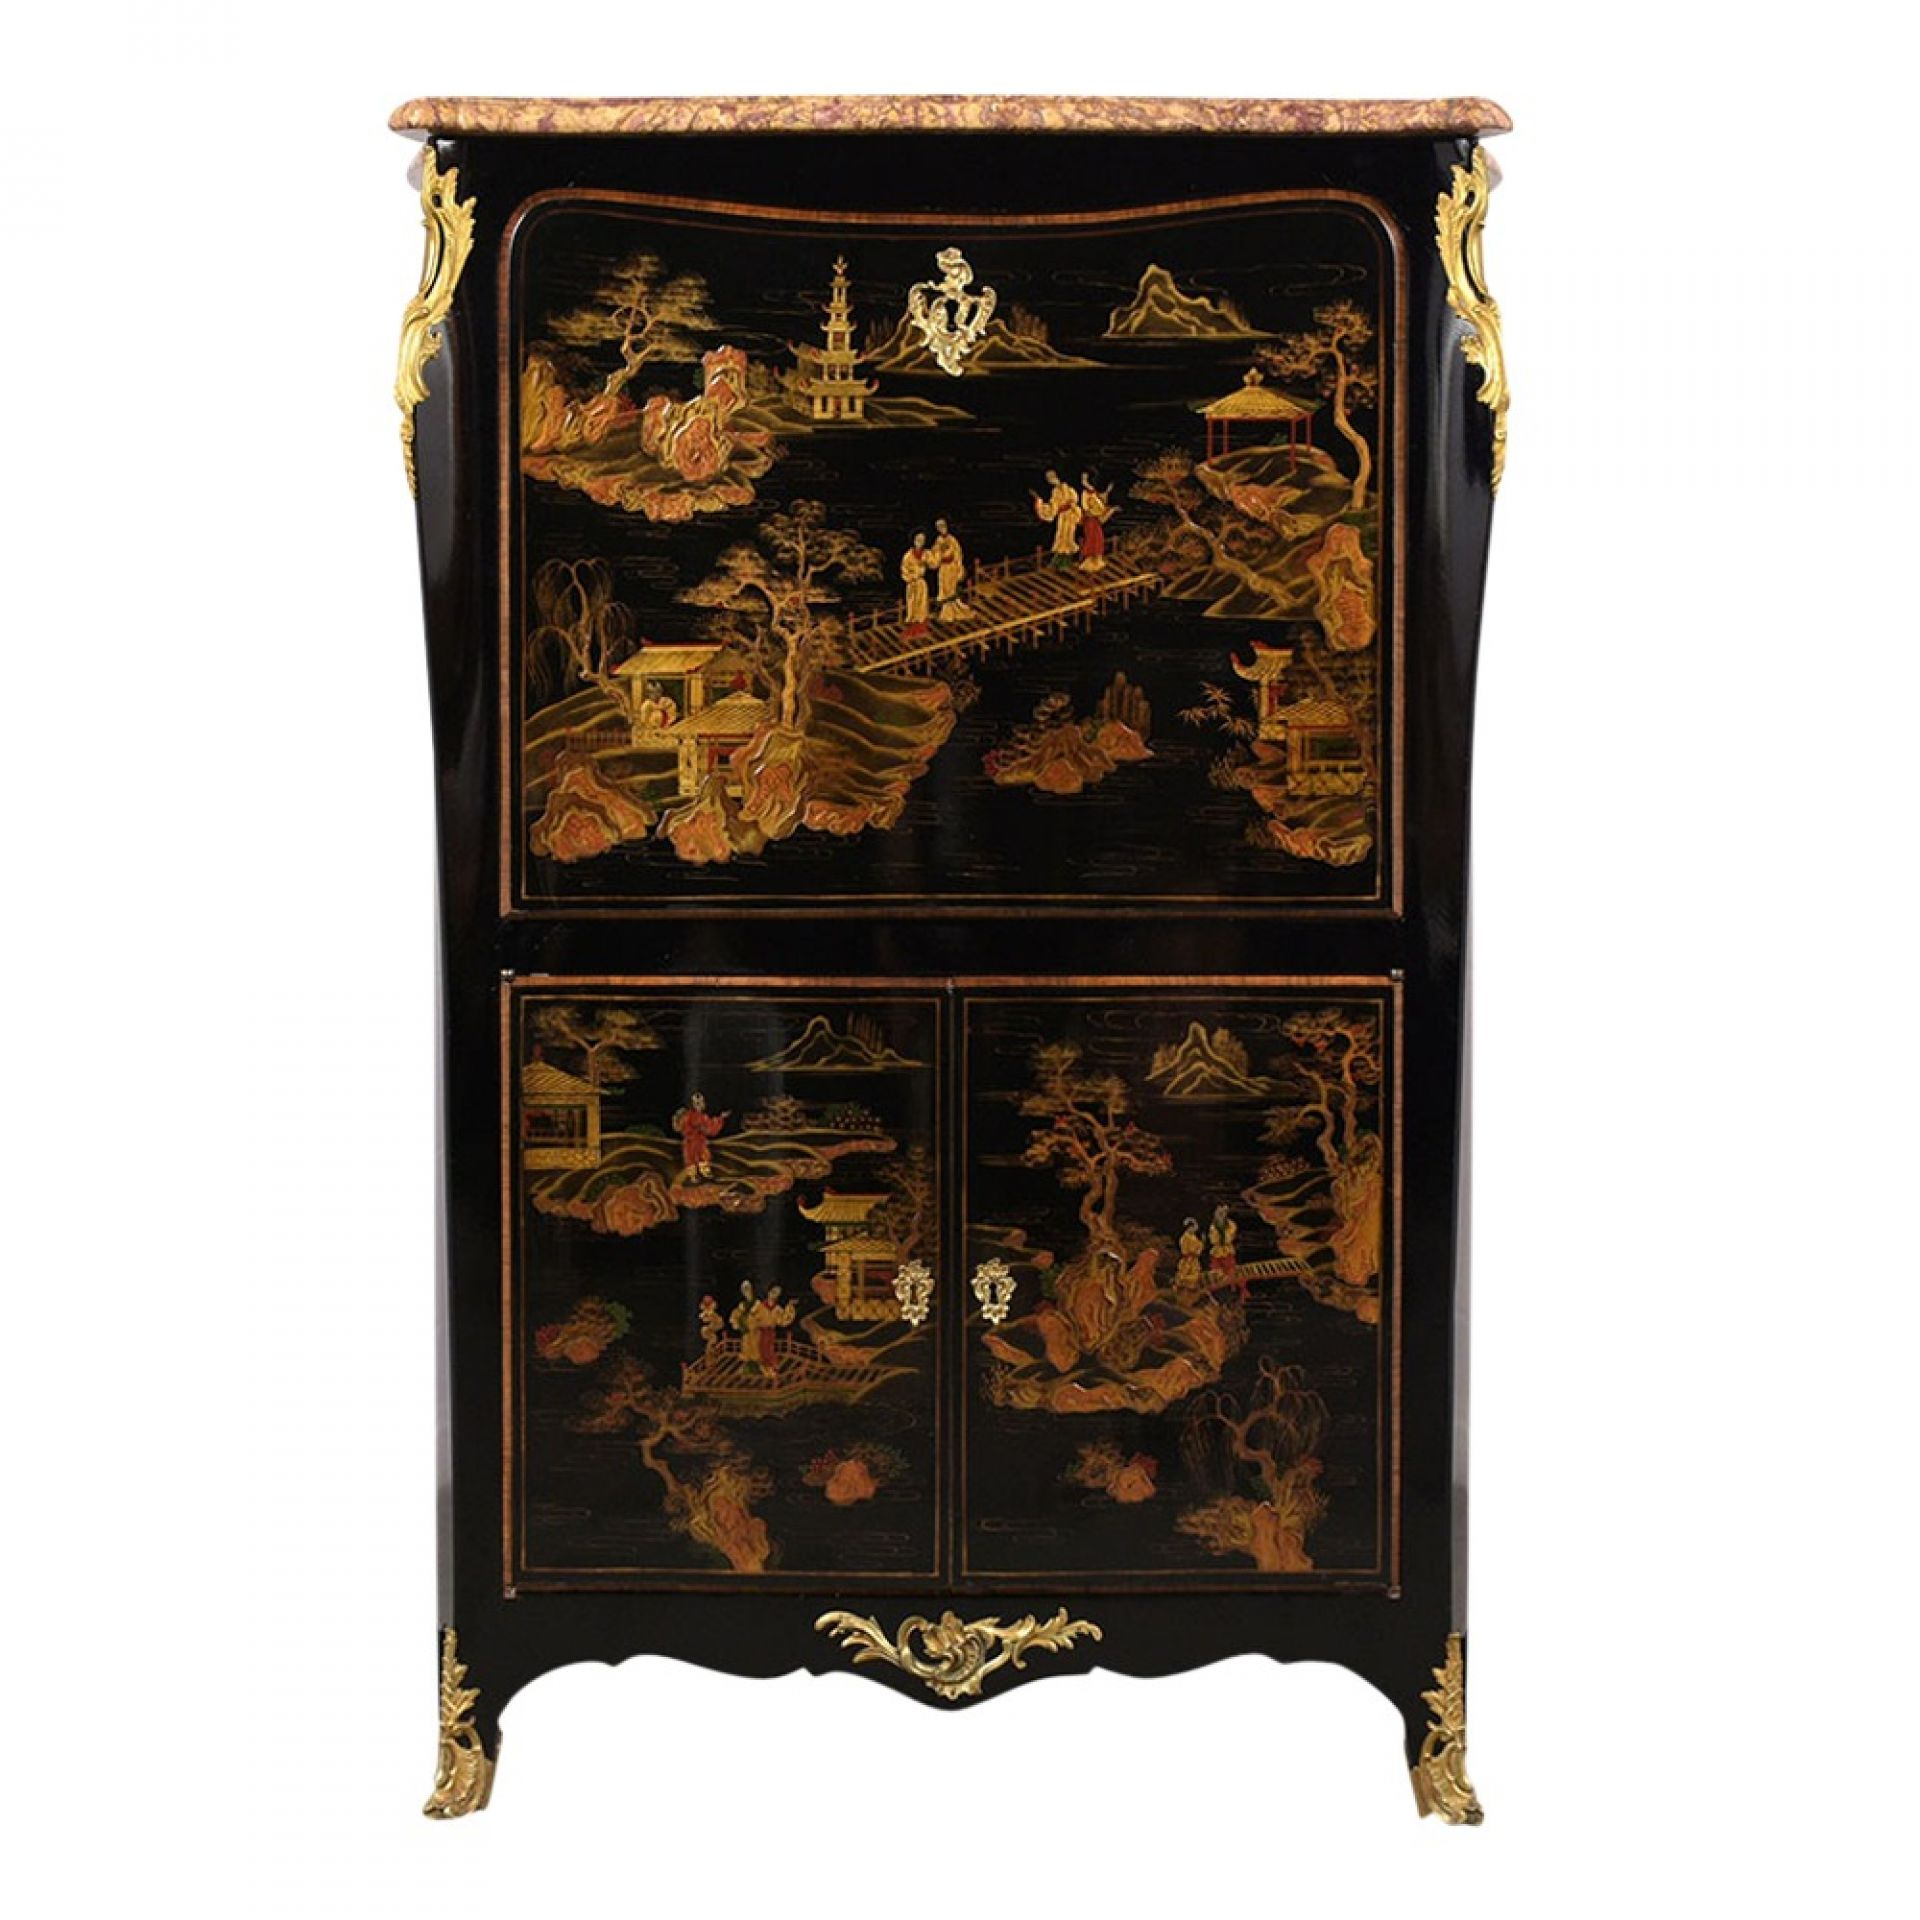 Antique French Louis XVI Chinoiserie-style Secretaire